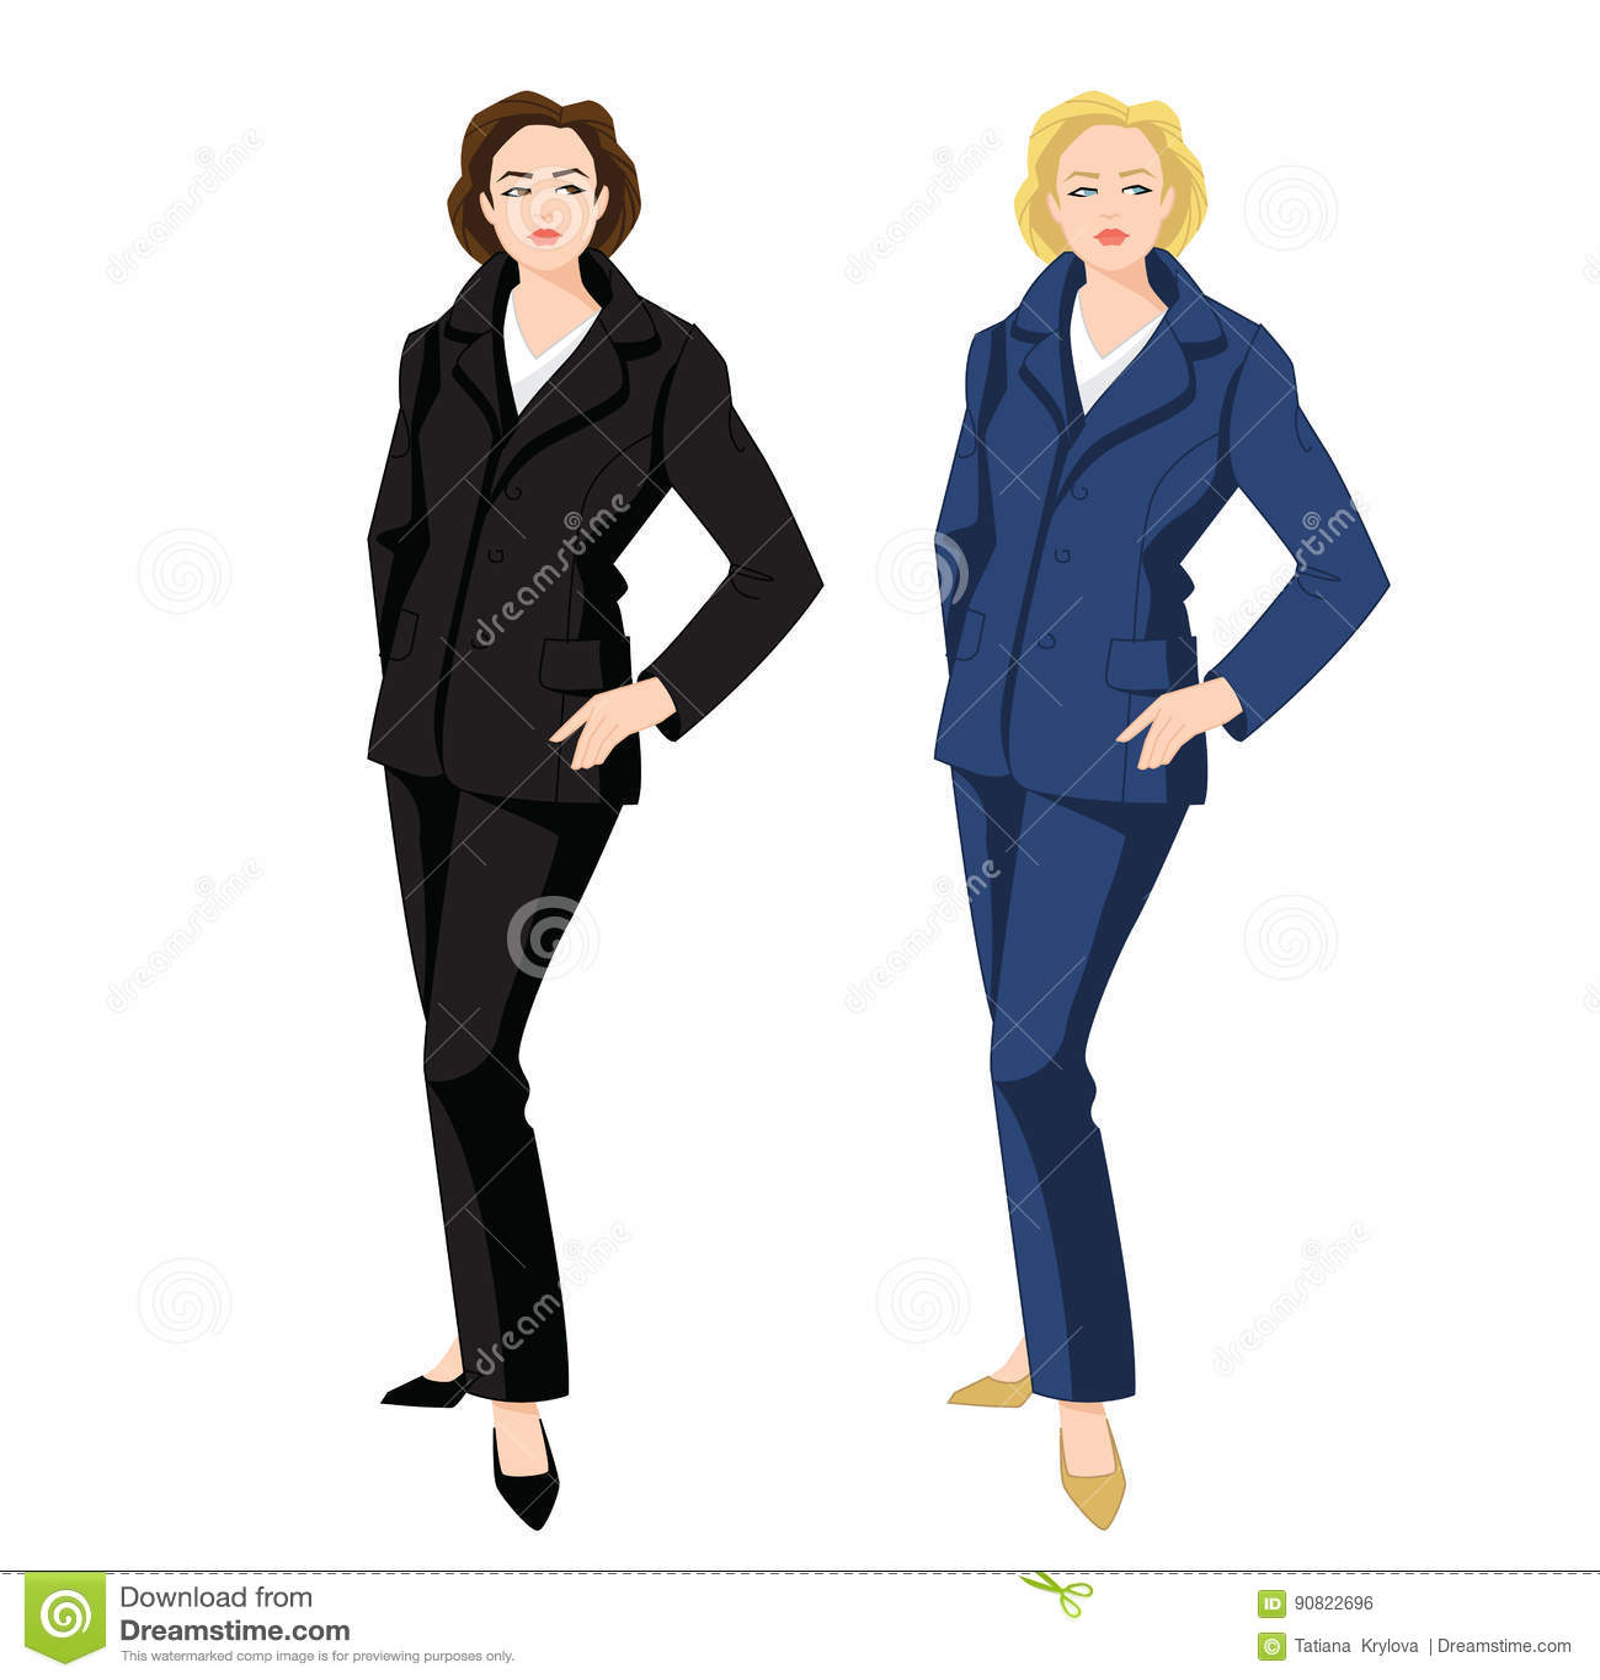 Vector Illustration Of Corporate Dress Code. Stock Vector ... 5624fef03